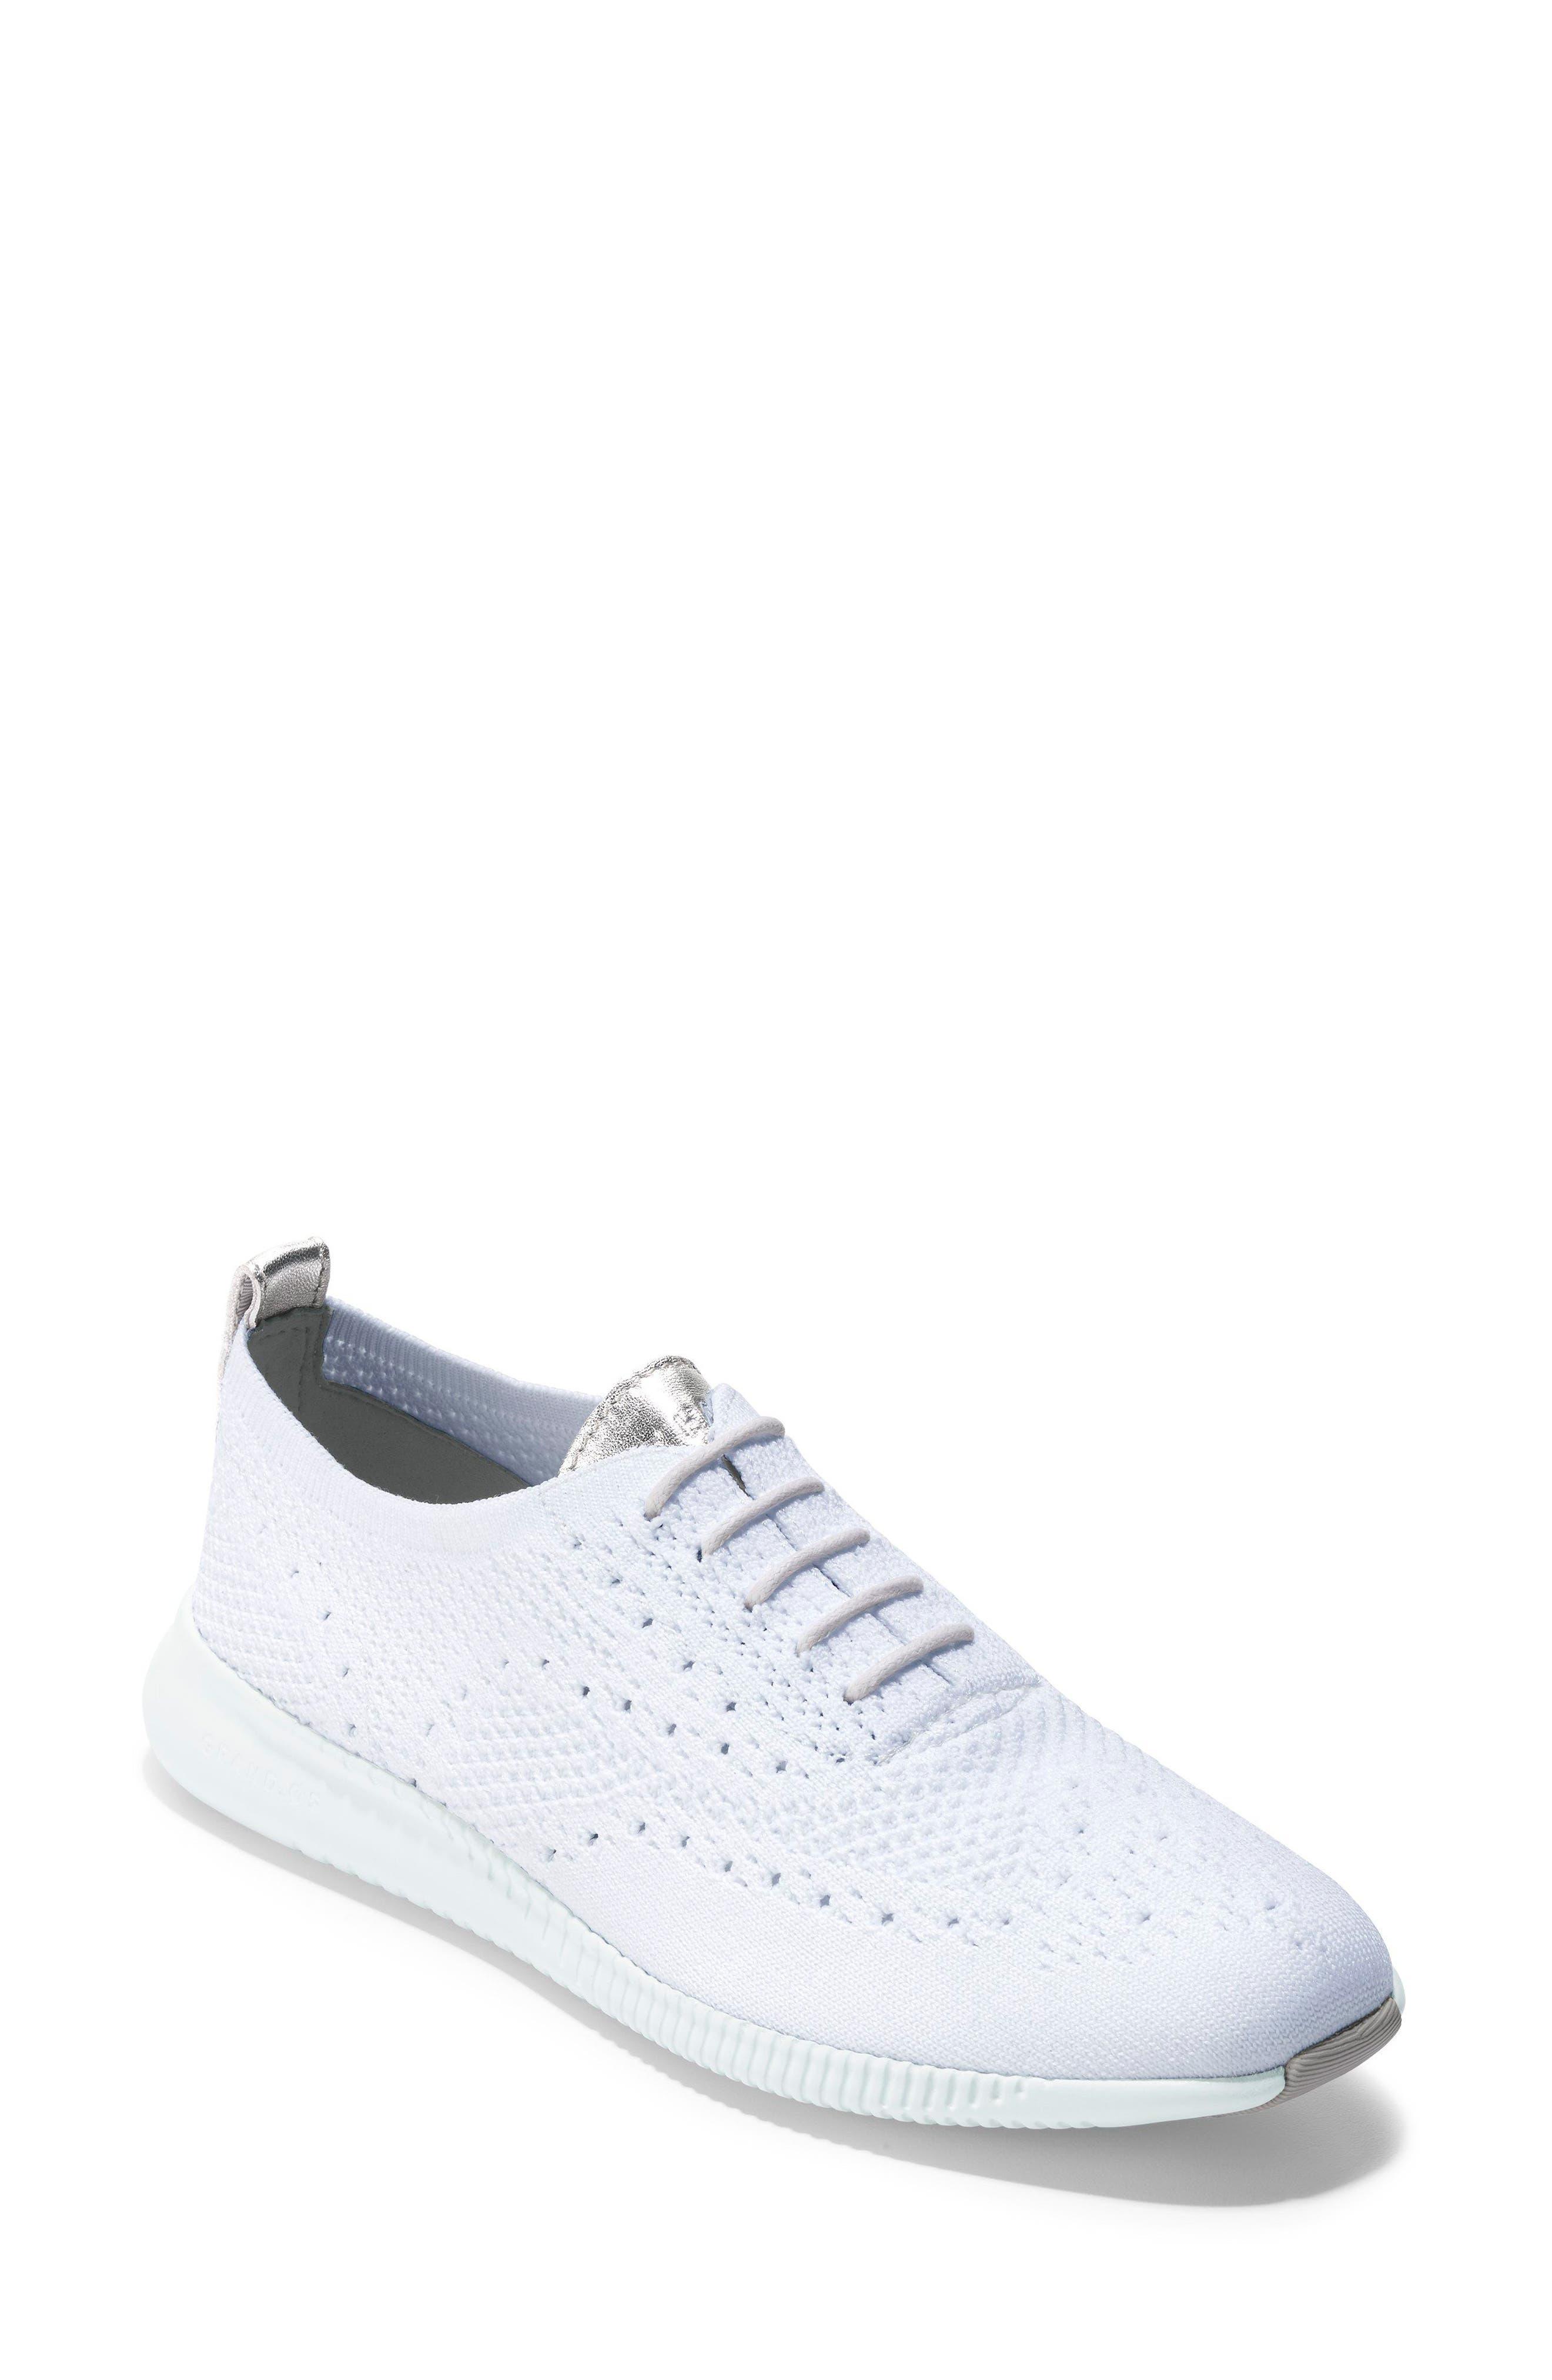 Cole Haan 2.ZERØGRAND Stitchlite Wingtip Sneaker (Women)